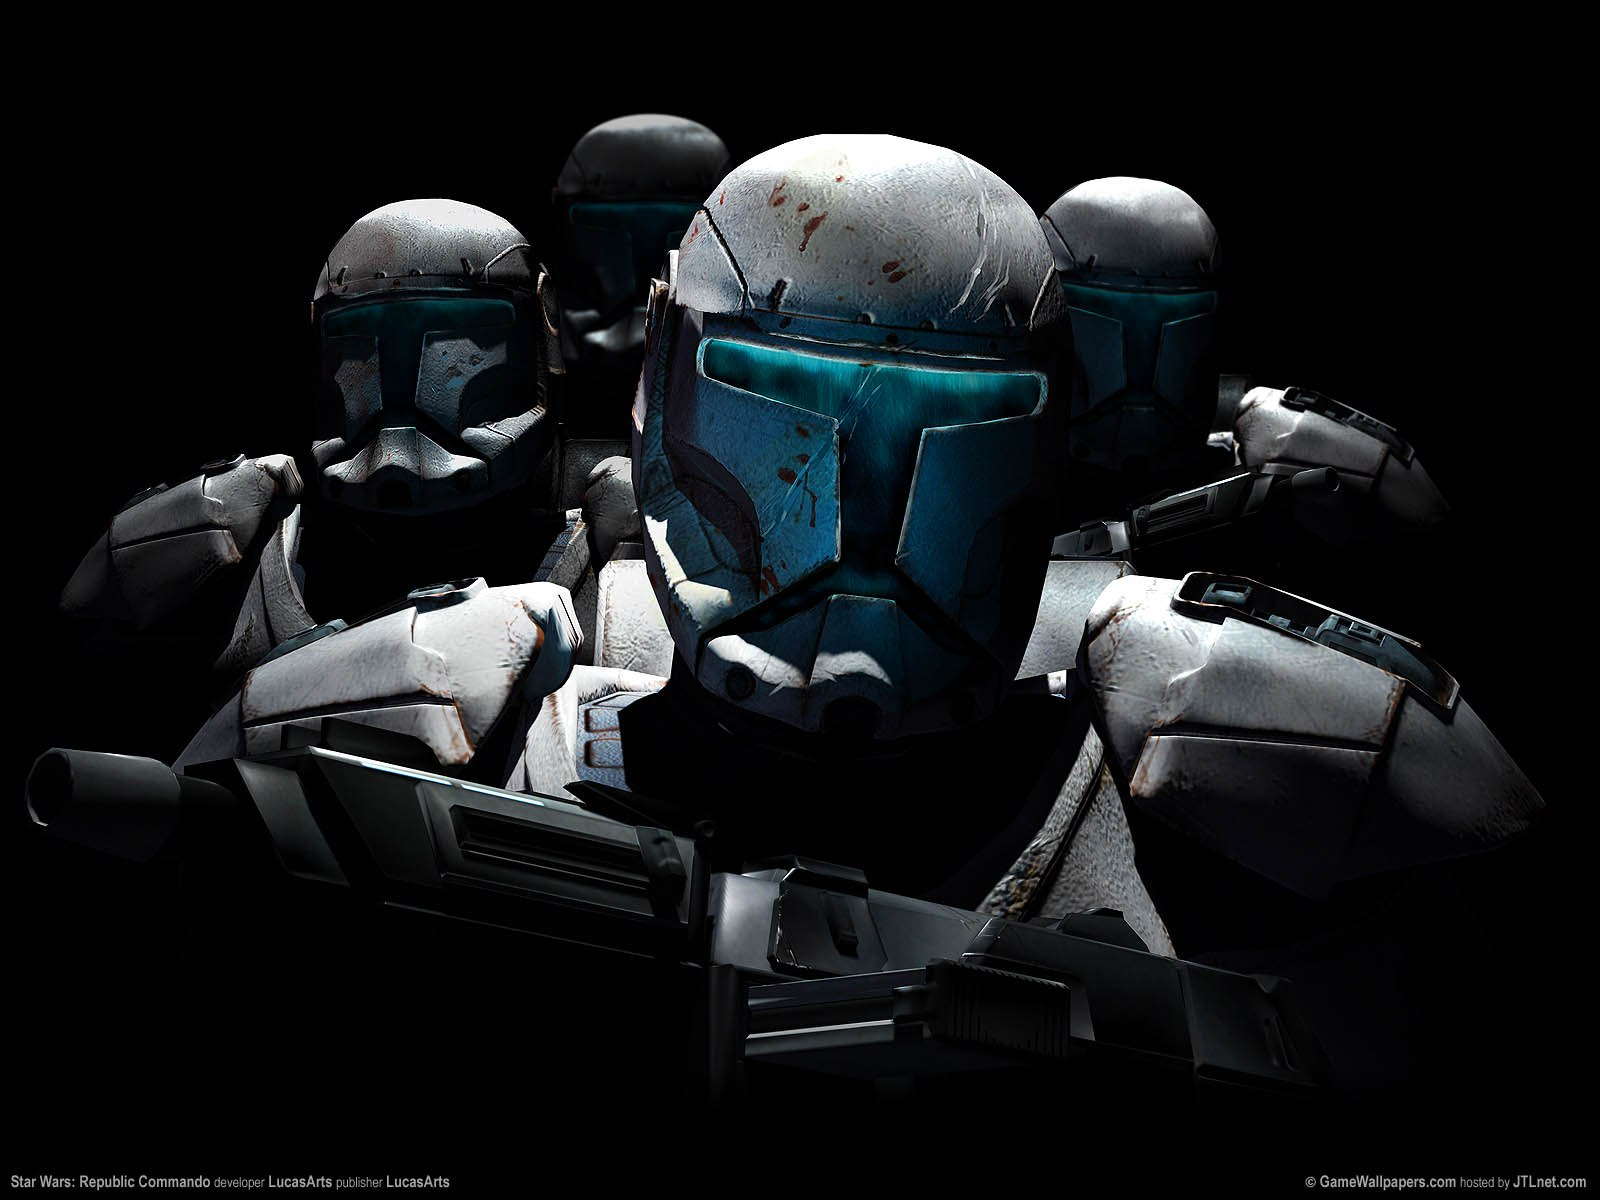 Star Wars Wallpaper Picture Seen On coolpicturegalleryblogspotcom 1600x1200